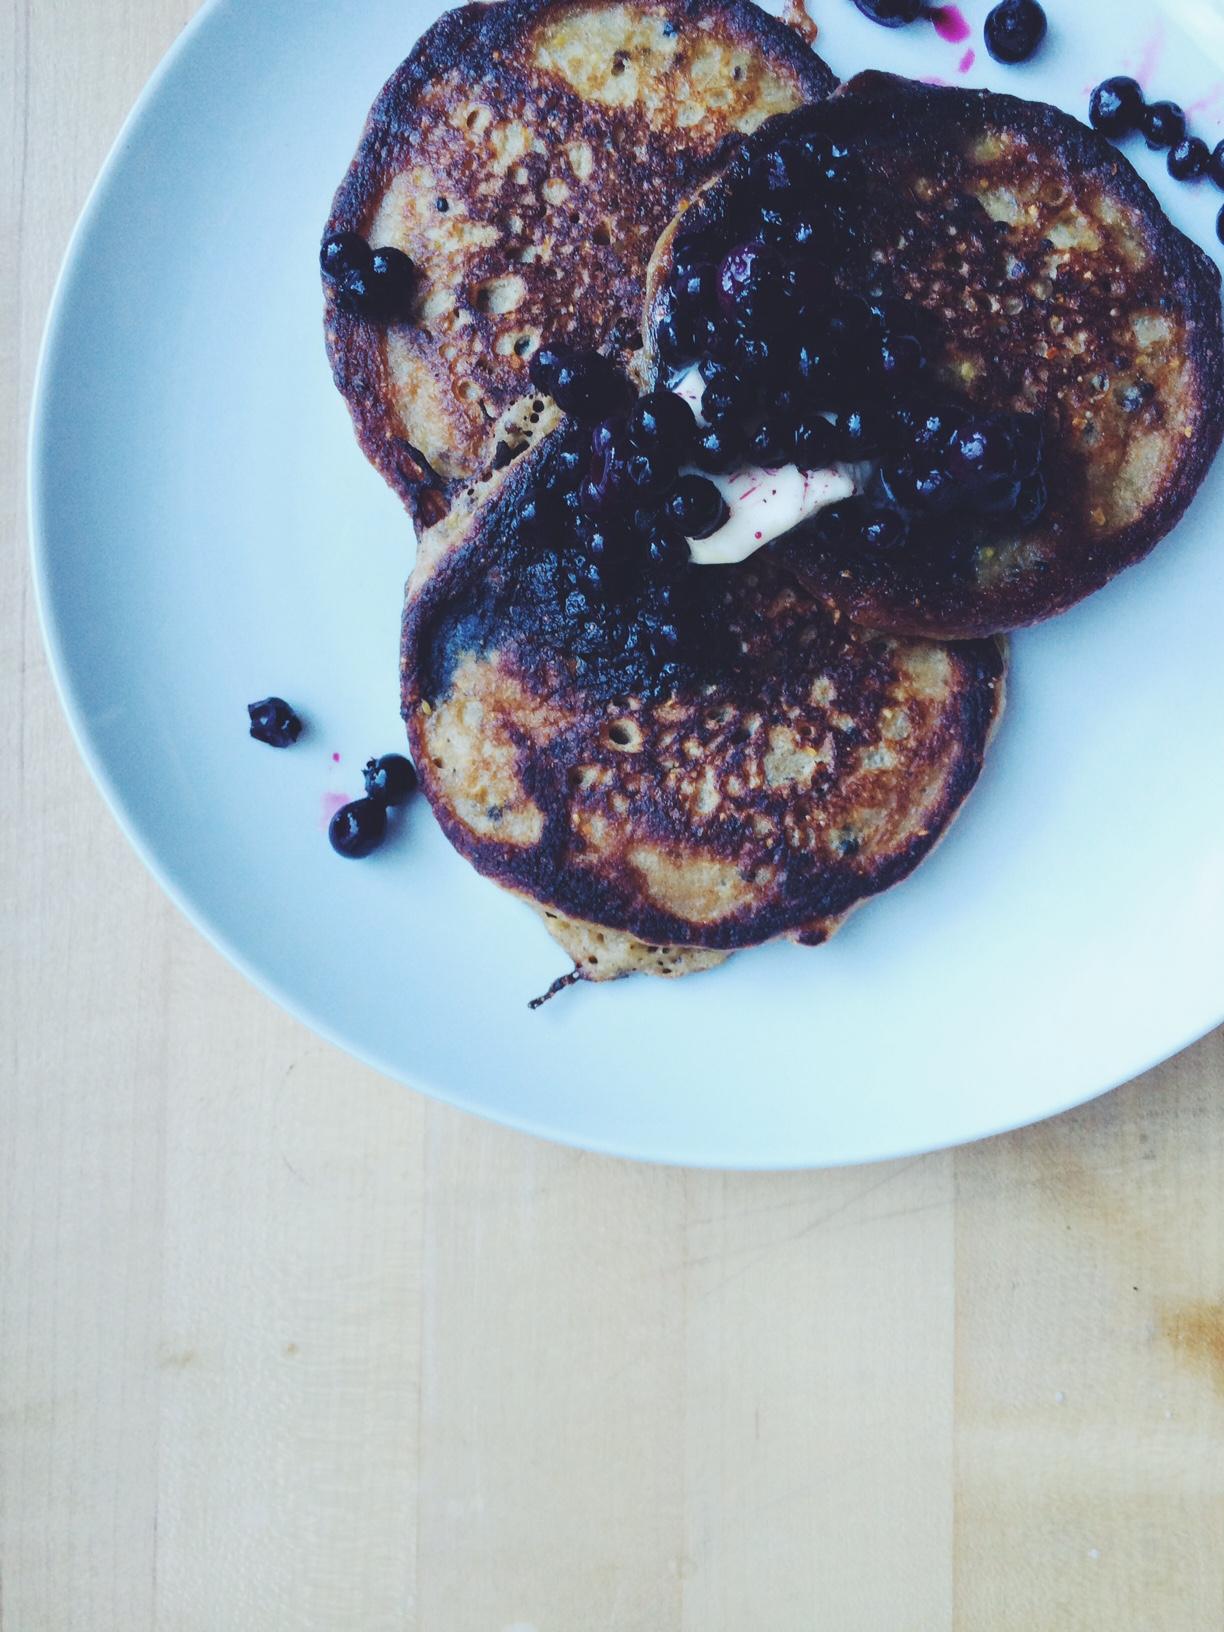 Zoe Nathan's Quinoa Pancakes / Eat This Poem